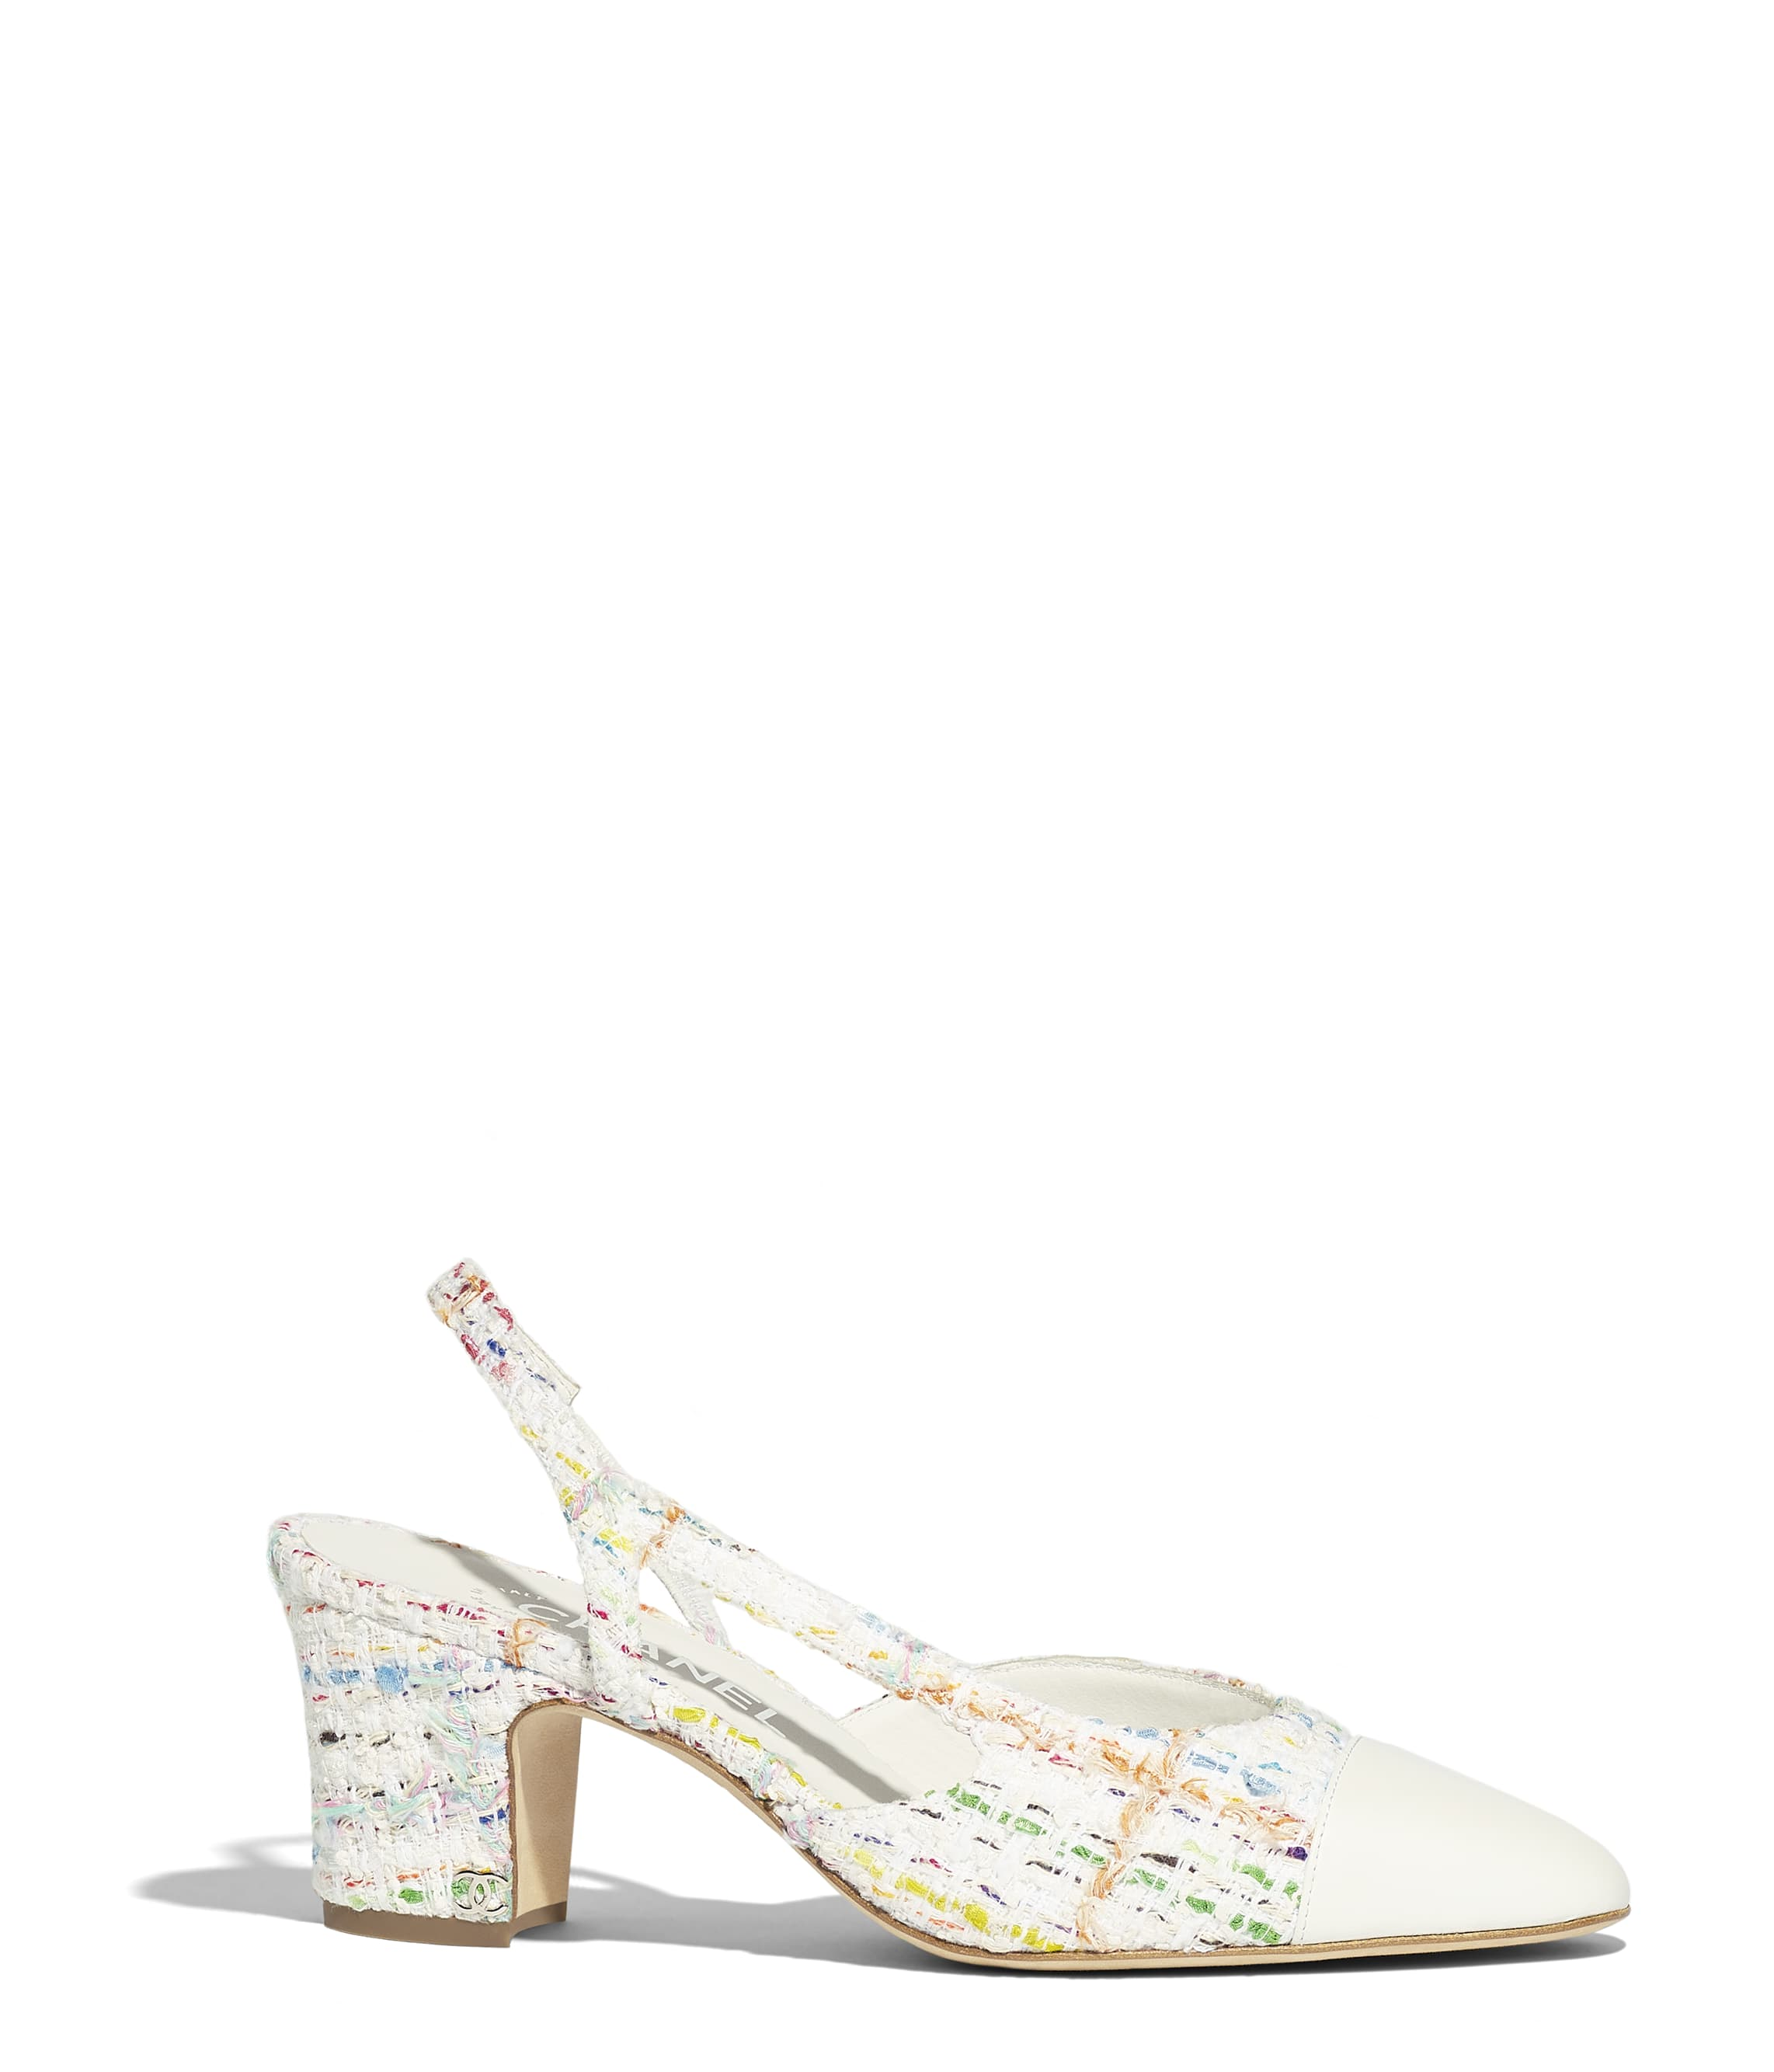 58c0593411f Escarpins   slingbacks - Chaussures - CHANEL